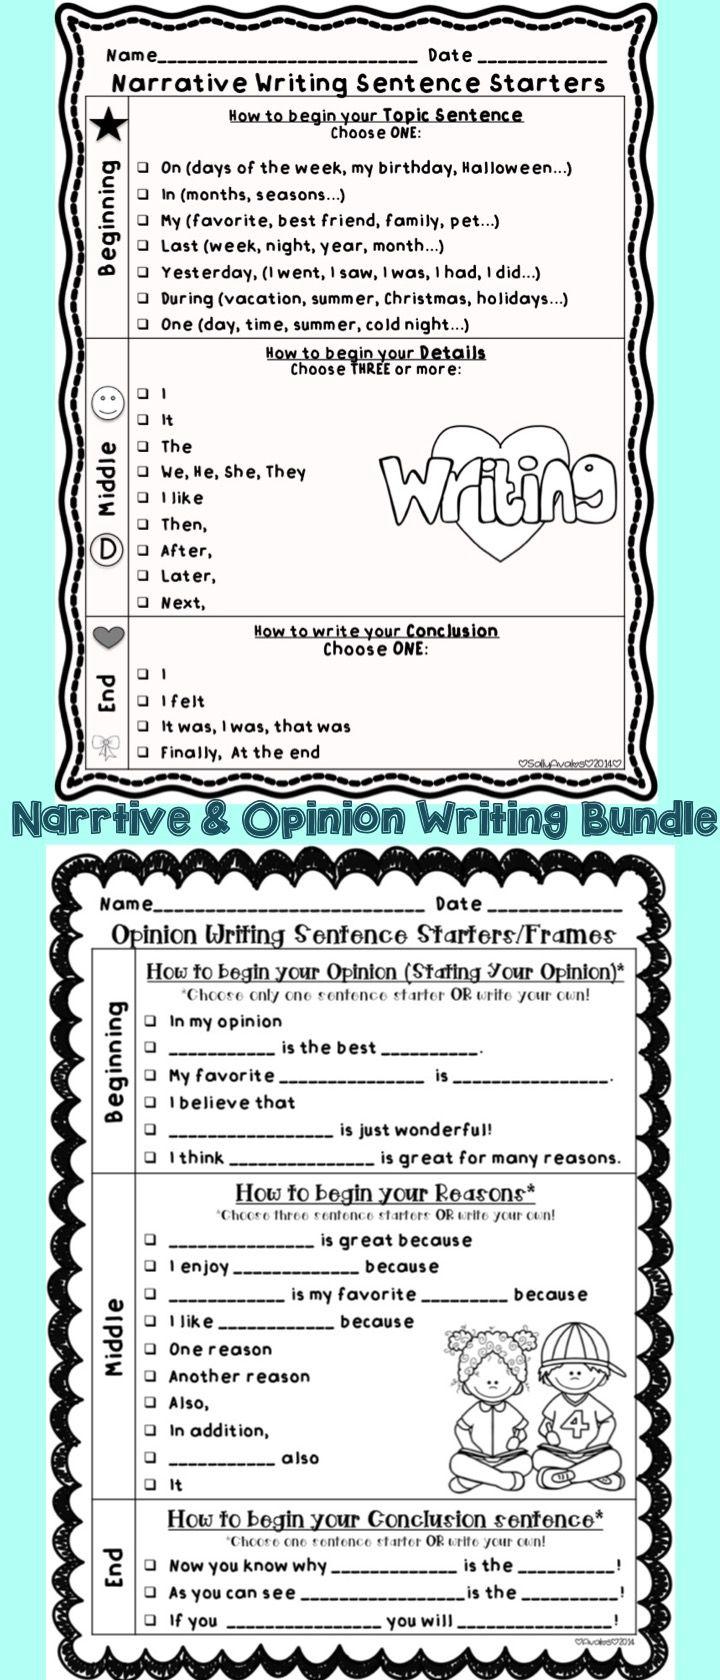 sentence starters for narrative writing